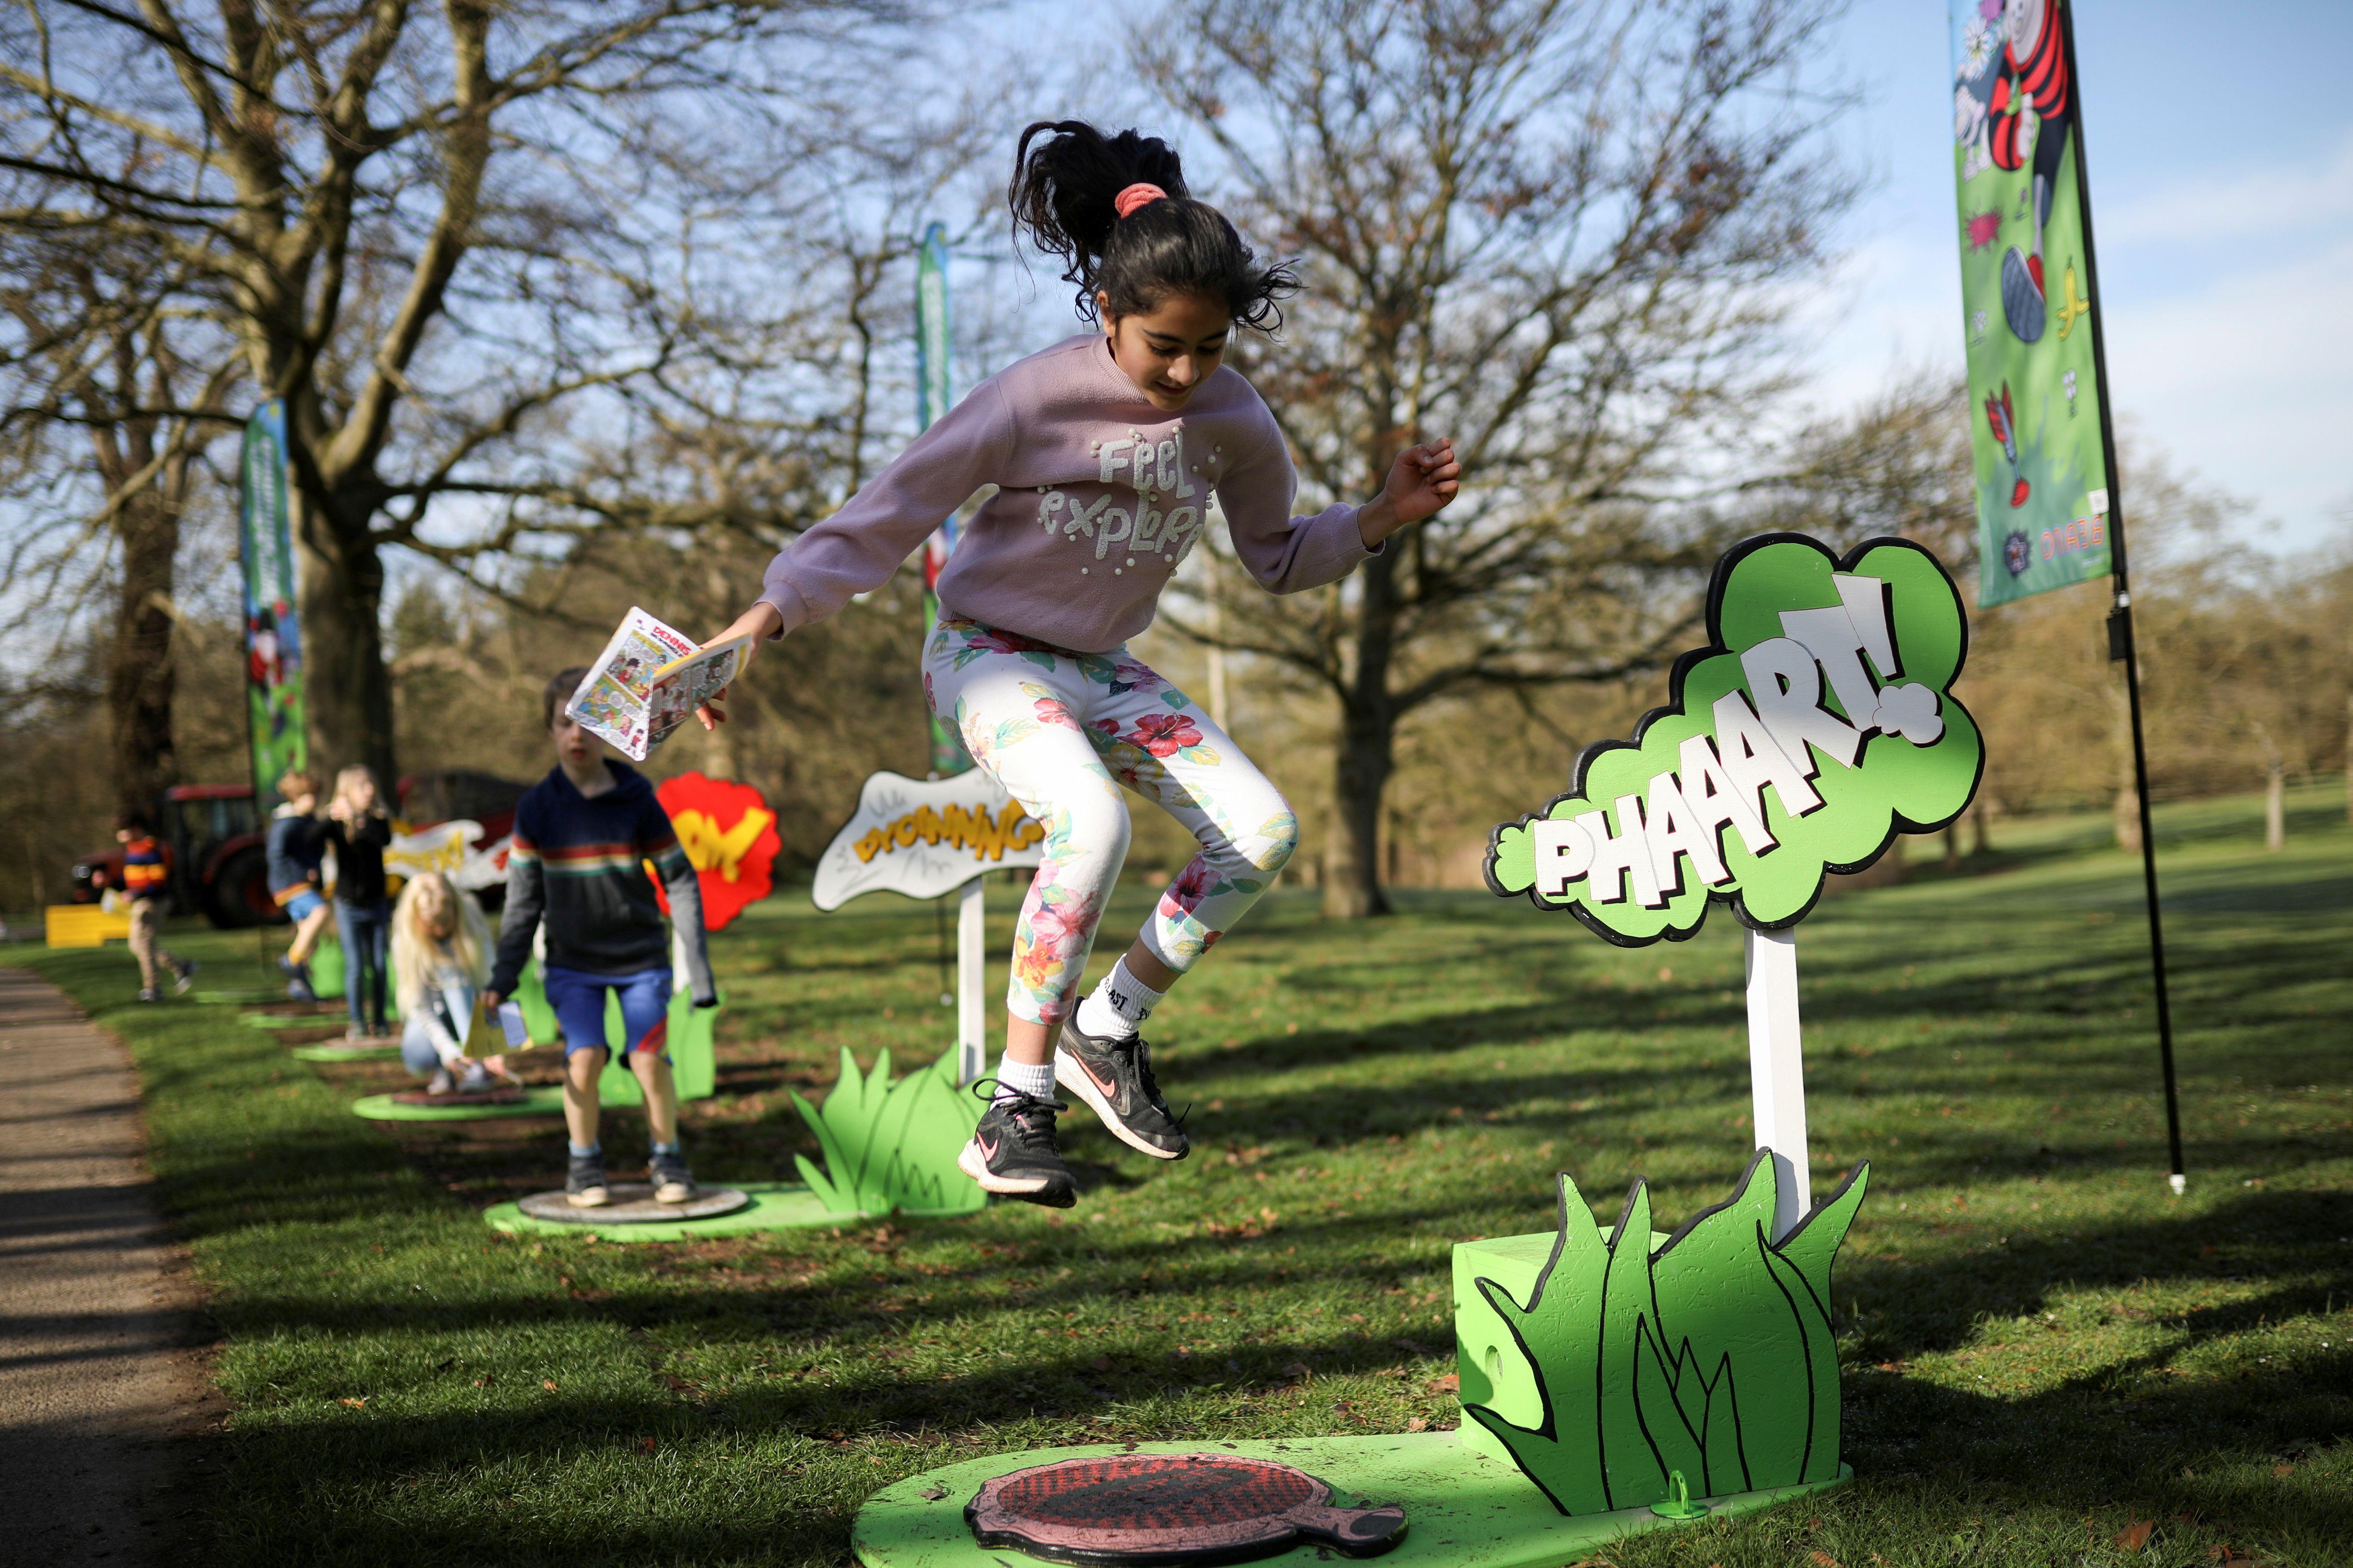 Niños juegan en los Royal Botanic Gardens, Kew in London, Britain, March 30, 2021. REUTERS/Tom Nicholson